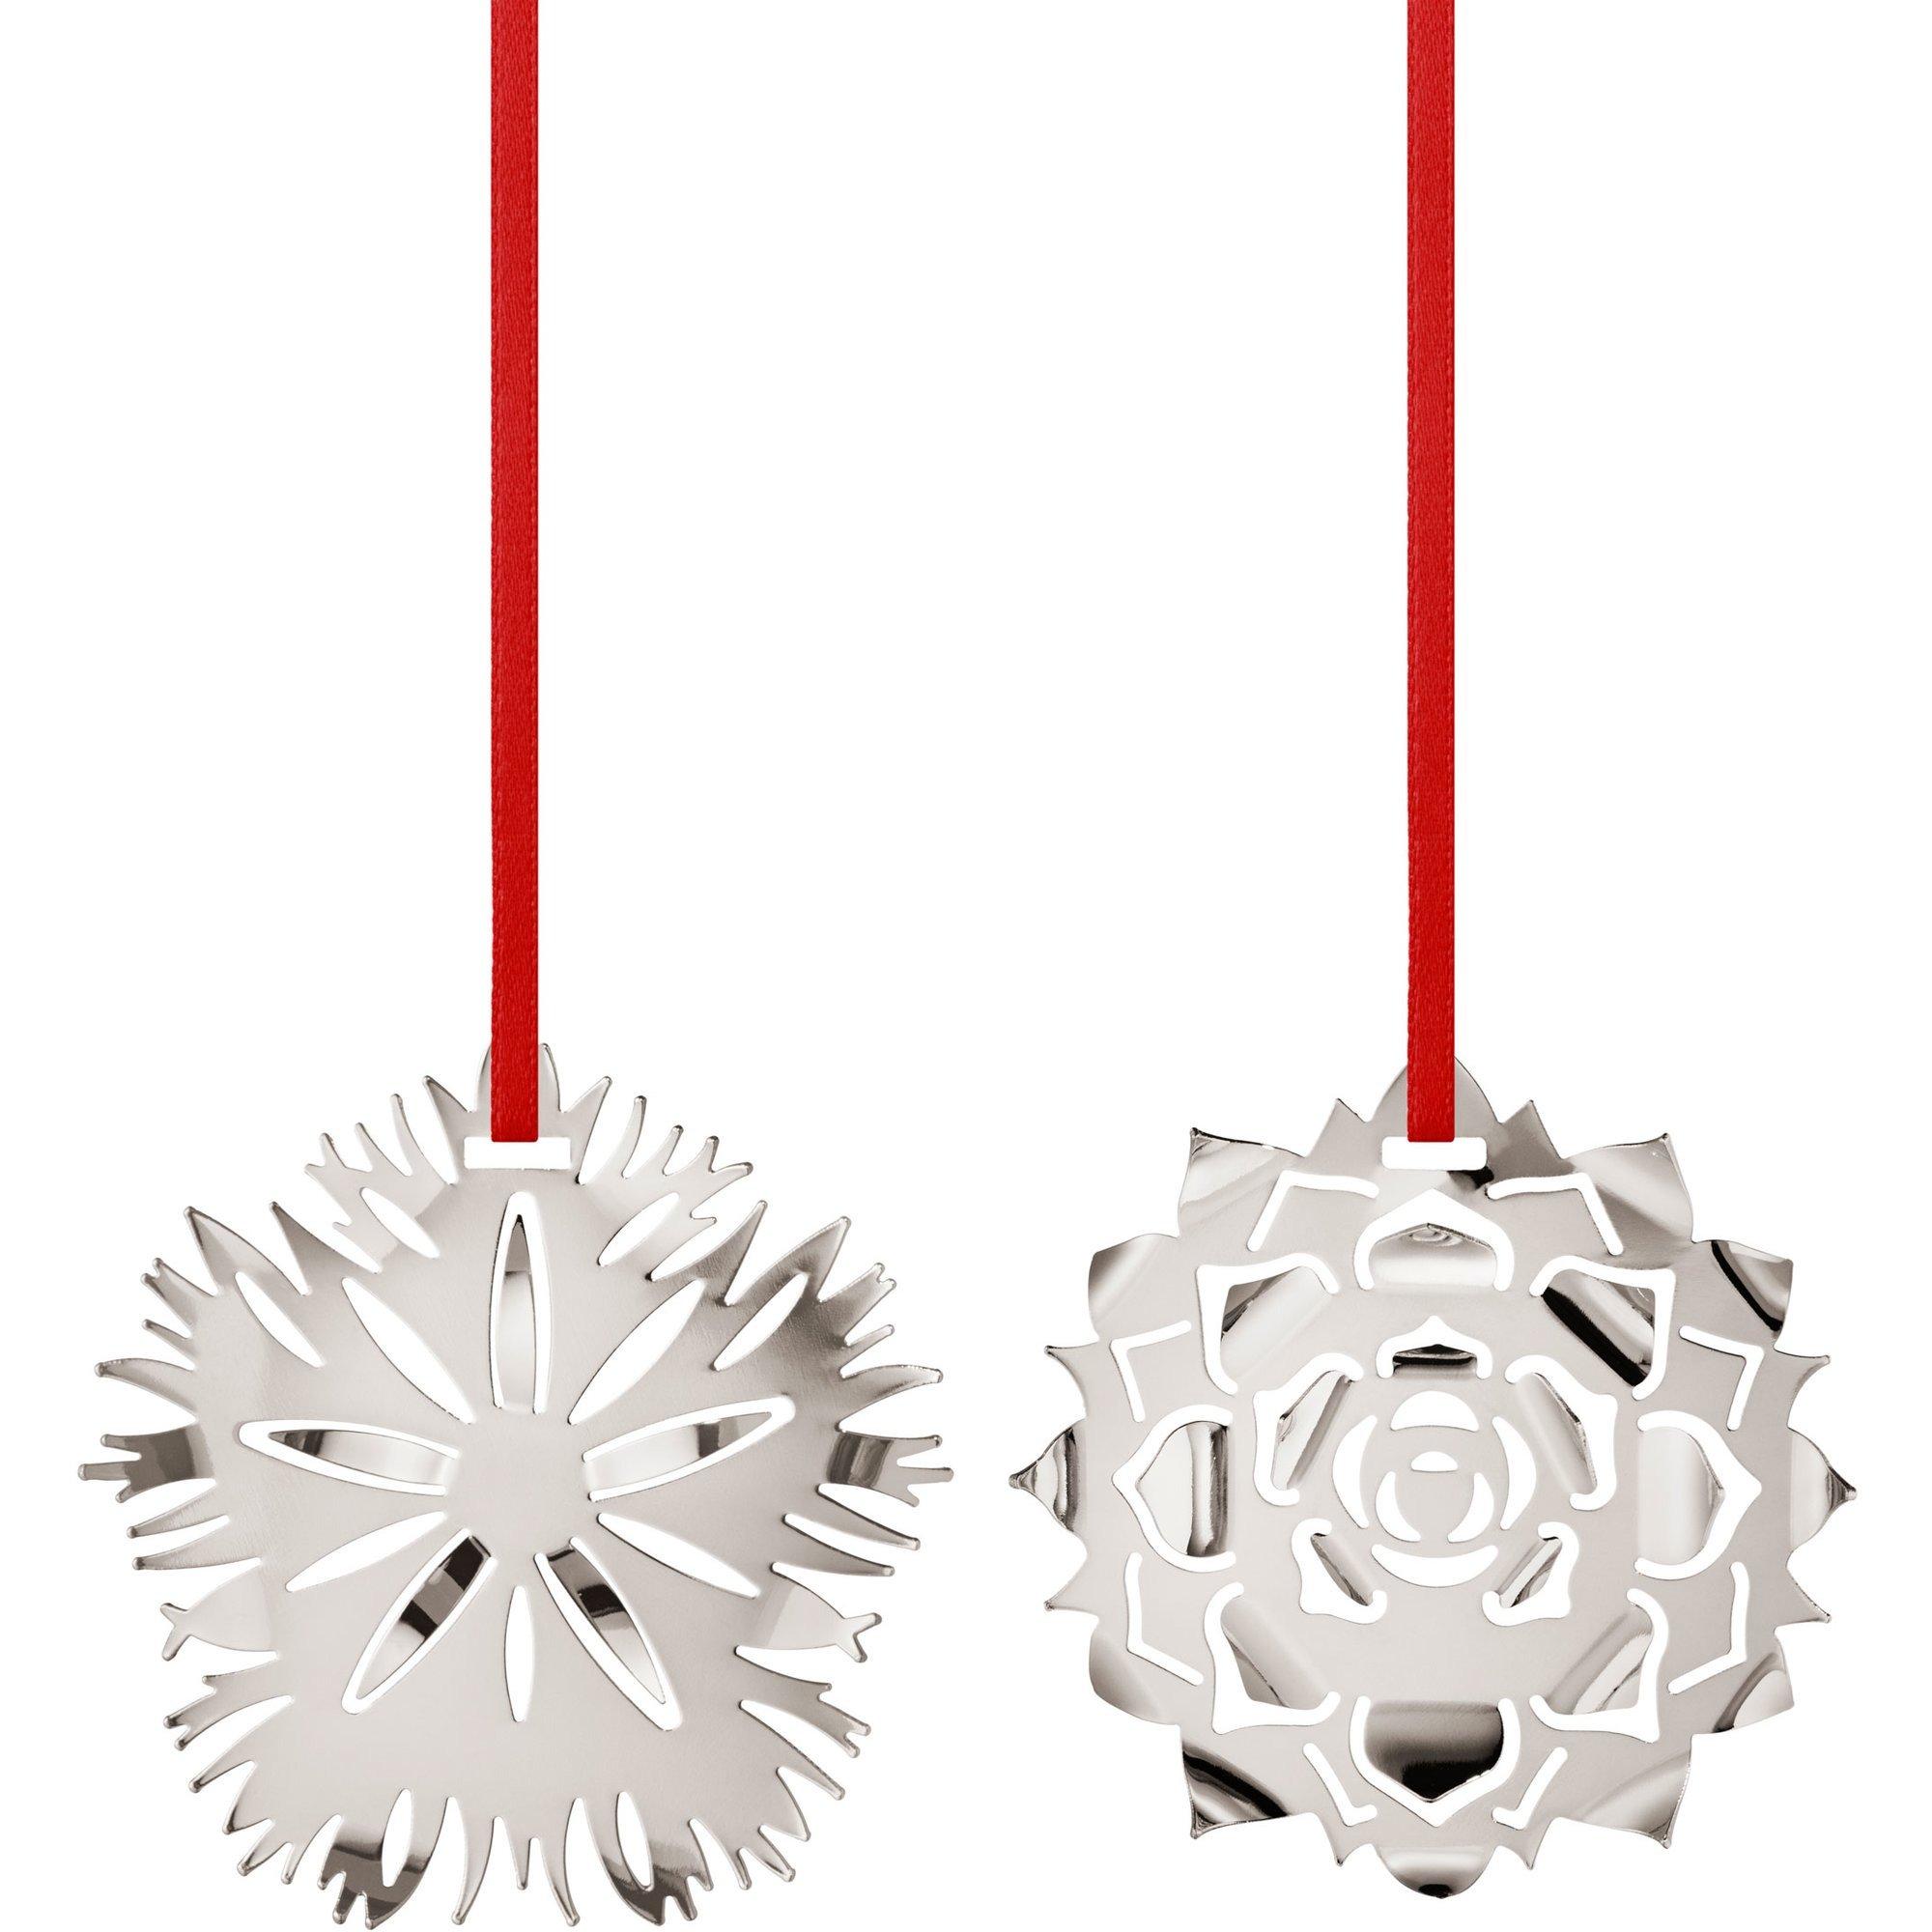 Georg Jensen 2020 Ornament Ice & Ice Rosette palladium